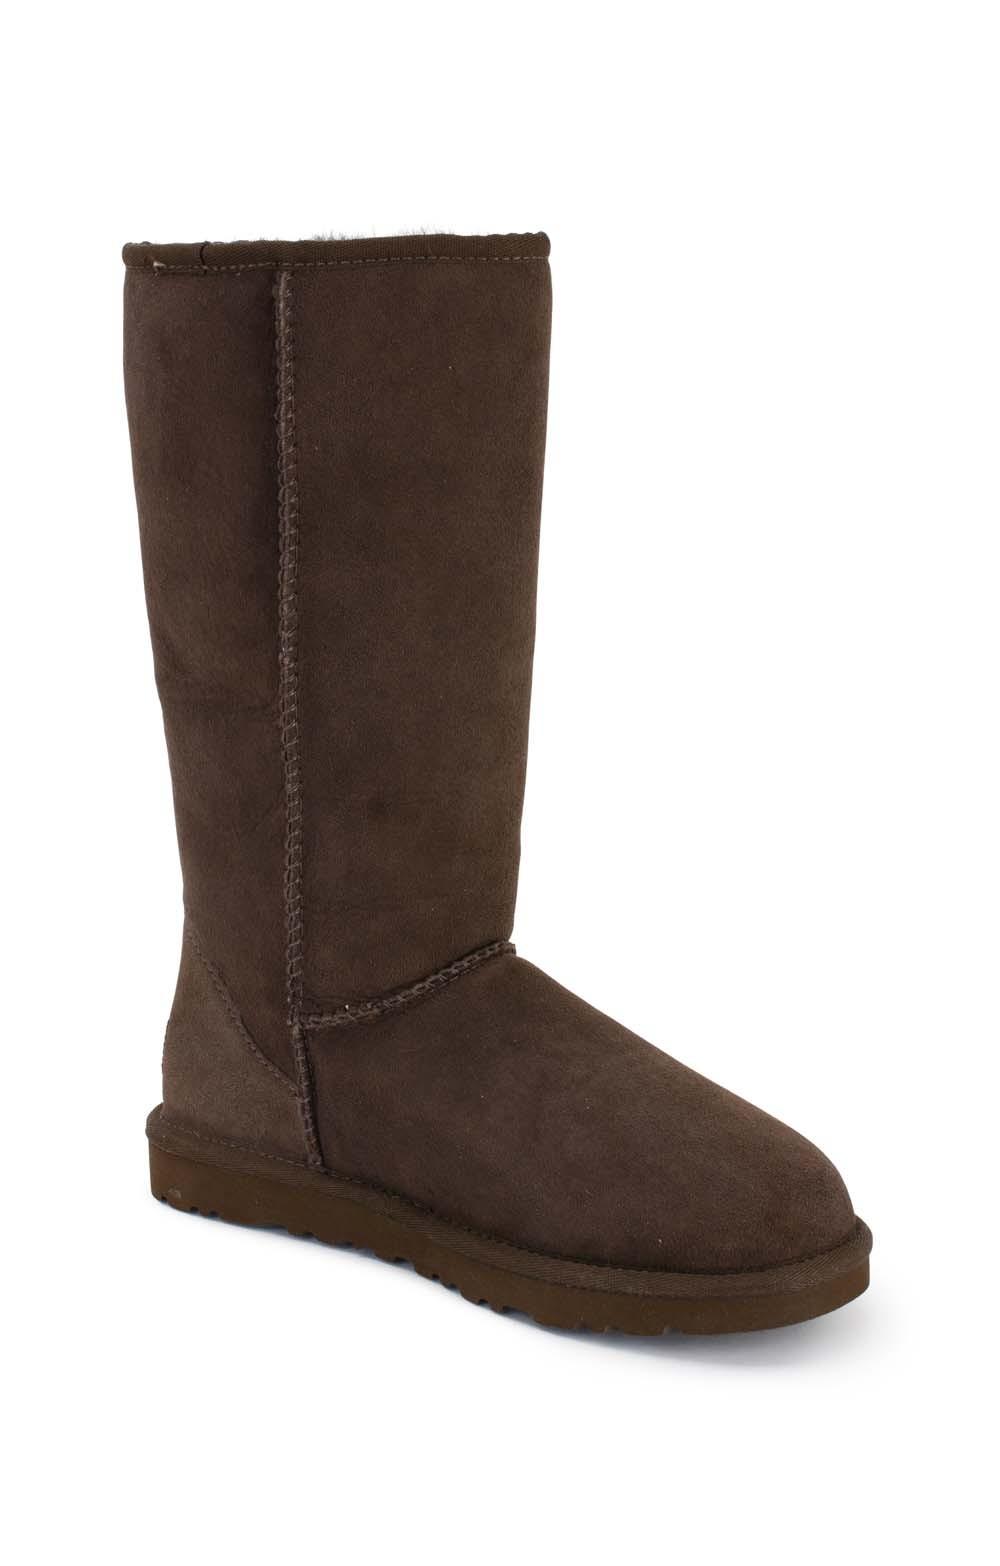 c3557cc7625 Ladies UGG Australia Classic Tall Boot